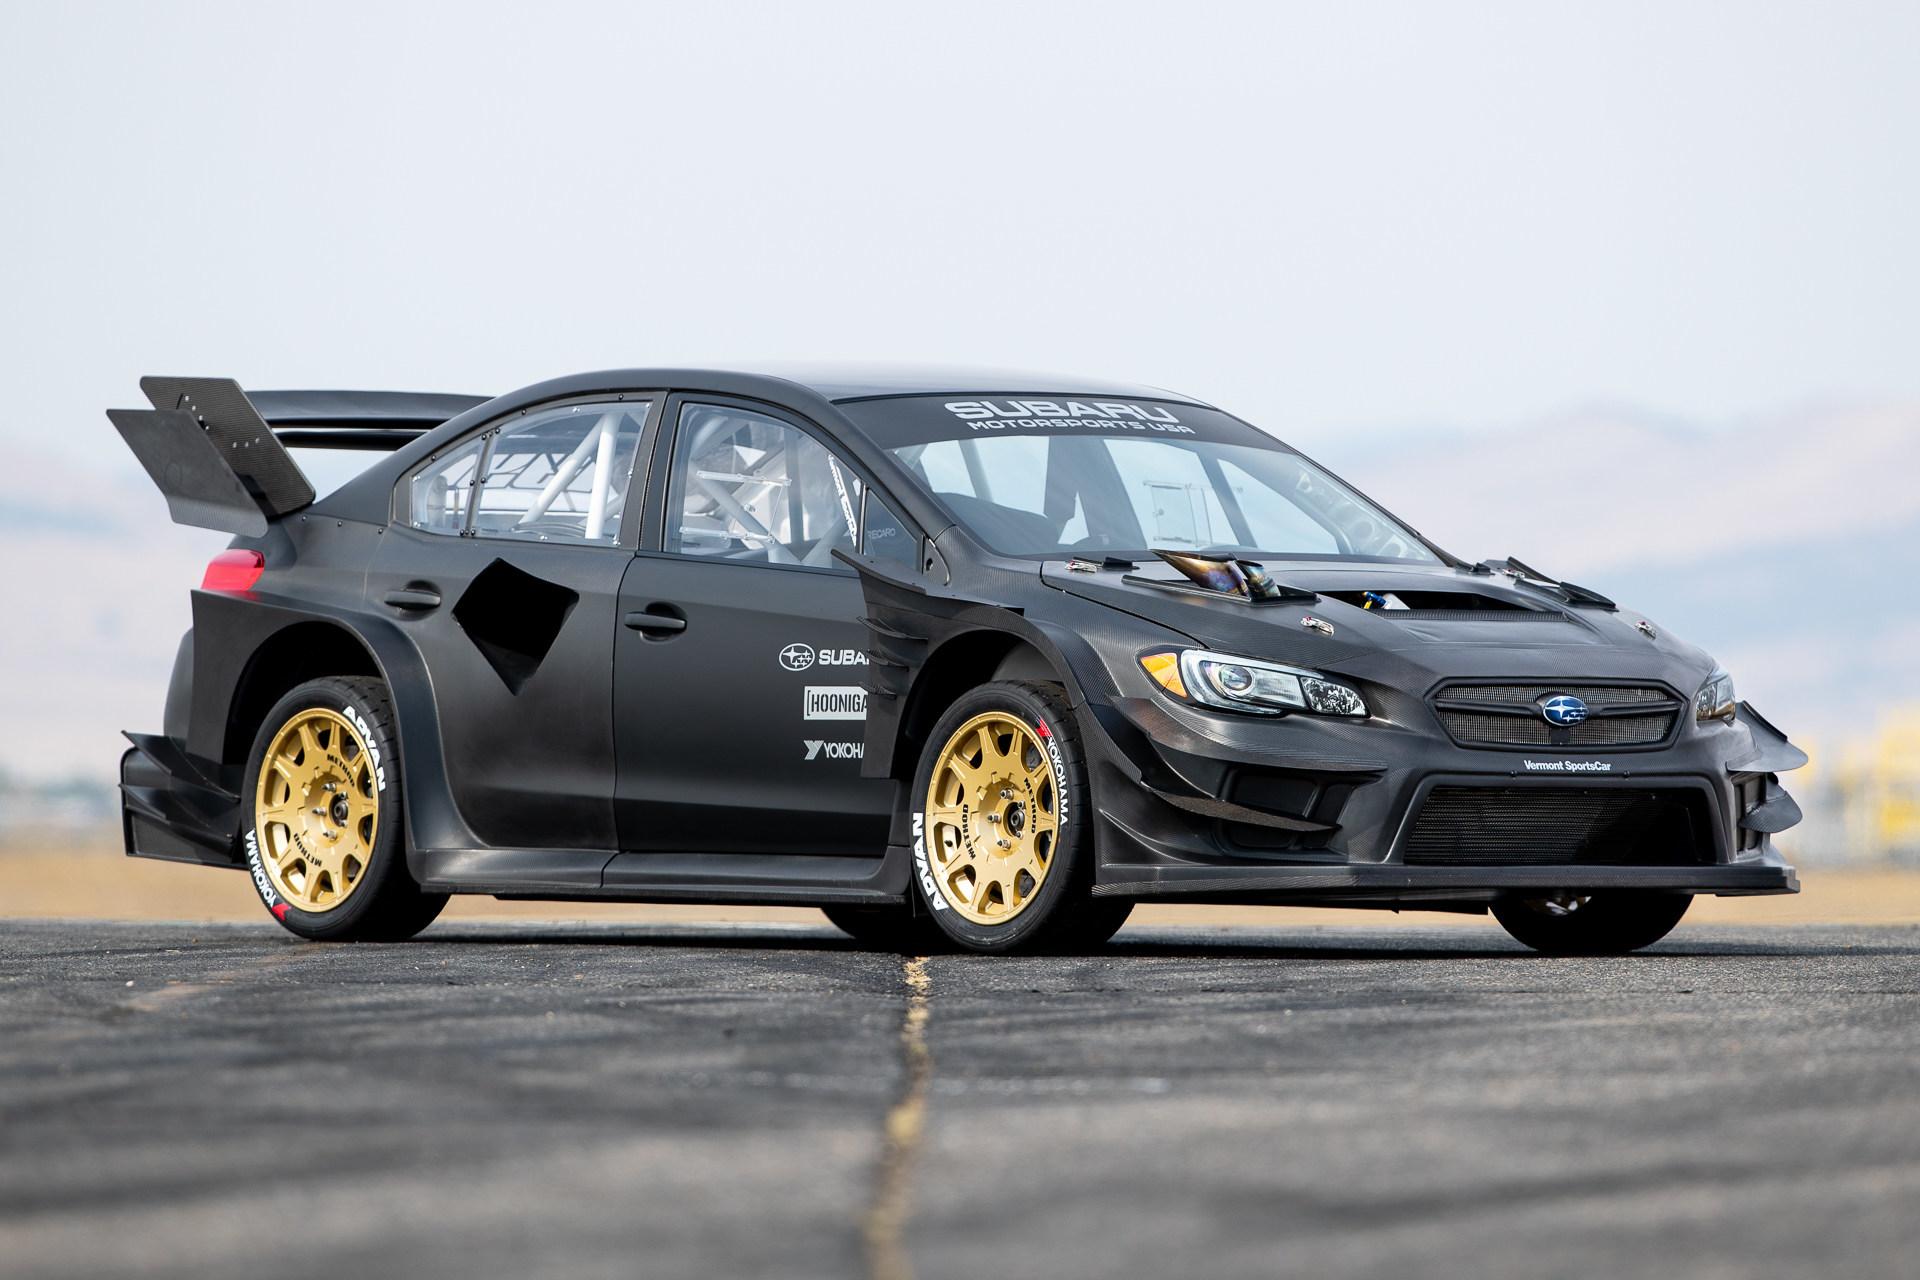 Subaru Reveals The Wildest WRX STI Ever - Travis Pastrana's Gymkhana STI